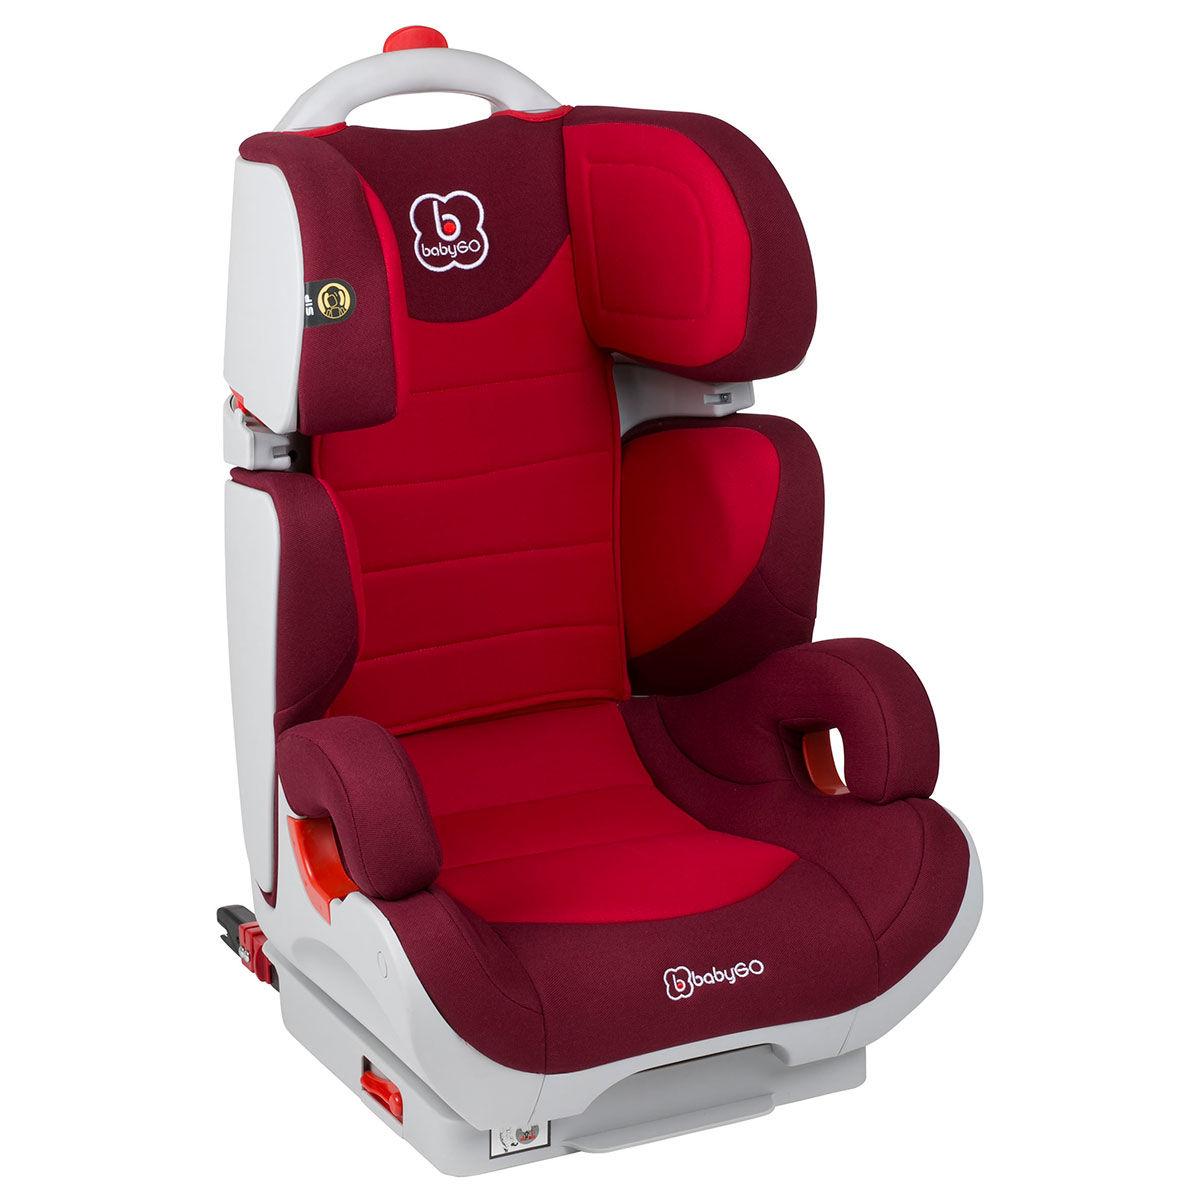 Afbeelding van Autostoel BabyGO Wega IsoFix Bordeaux (15-36kg)